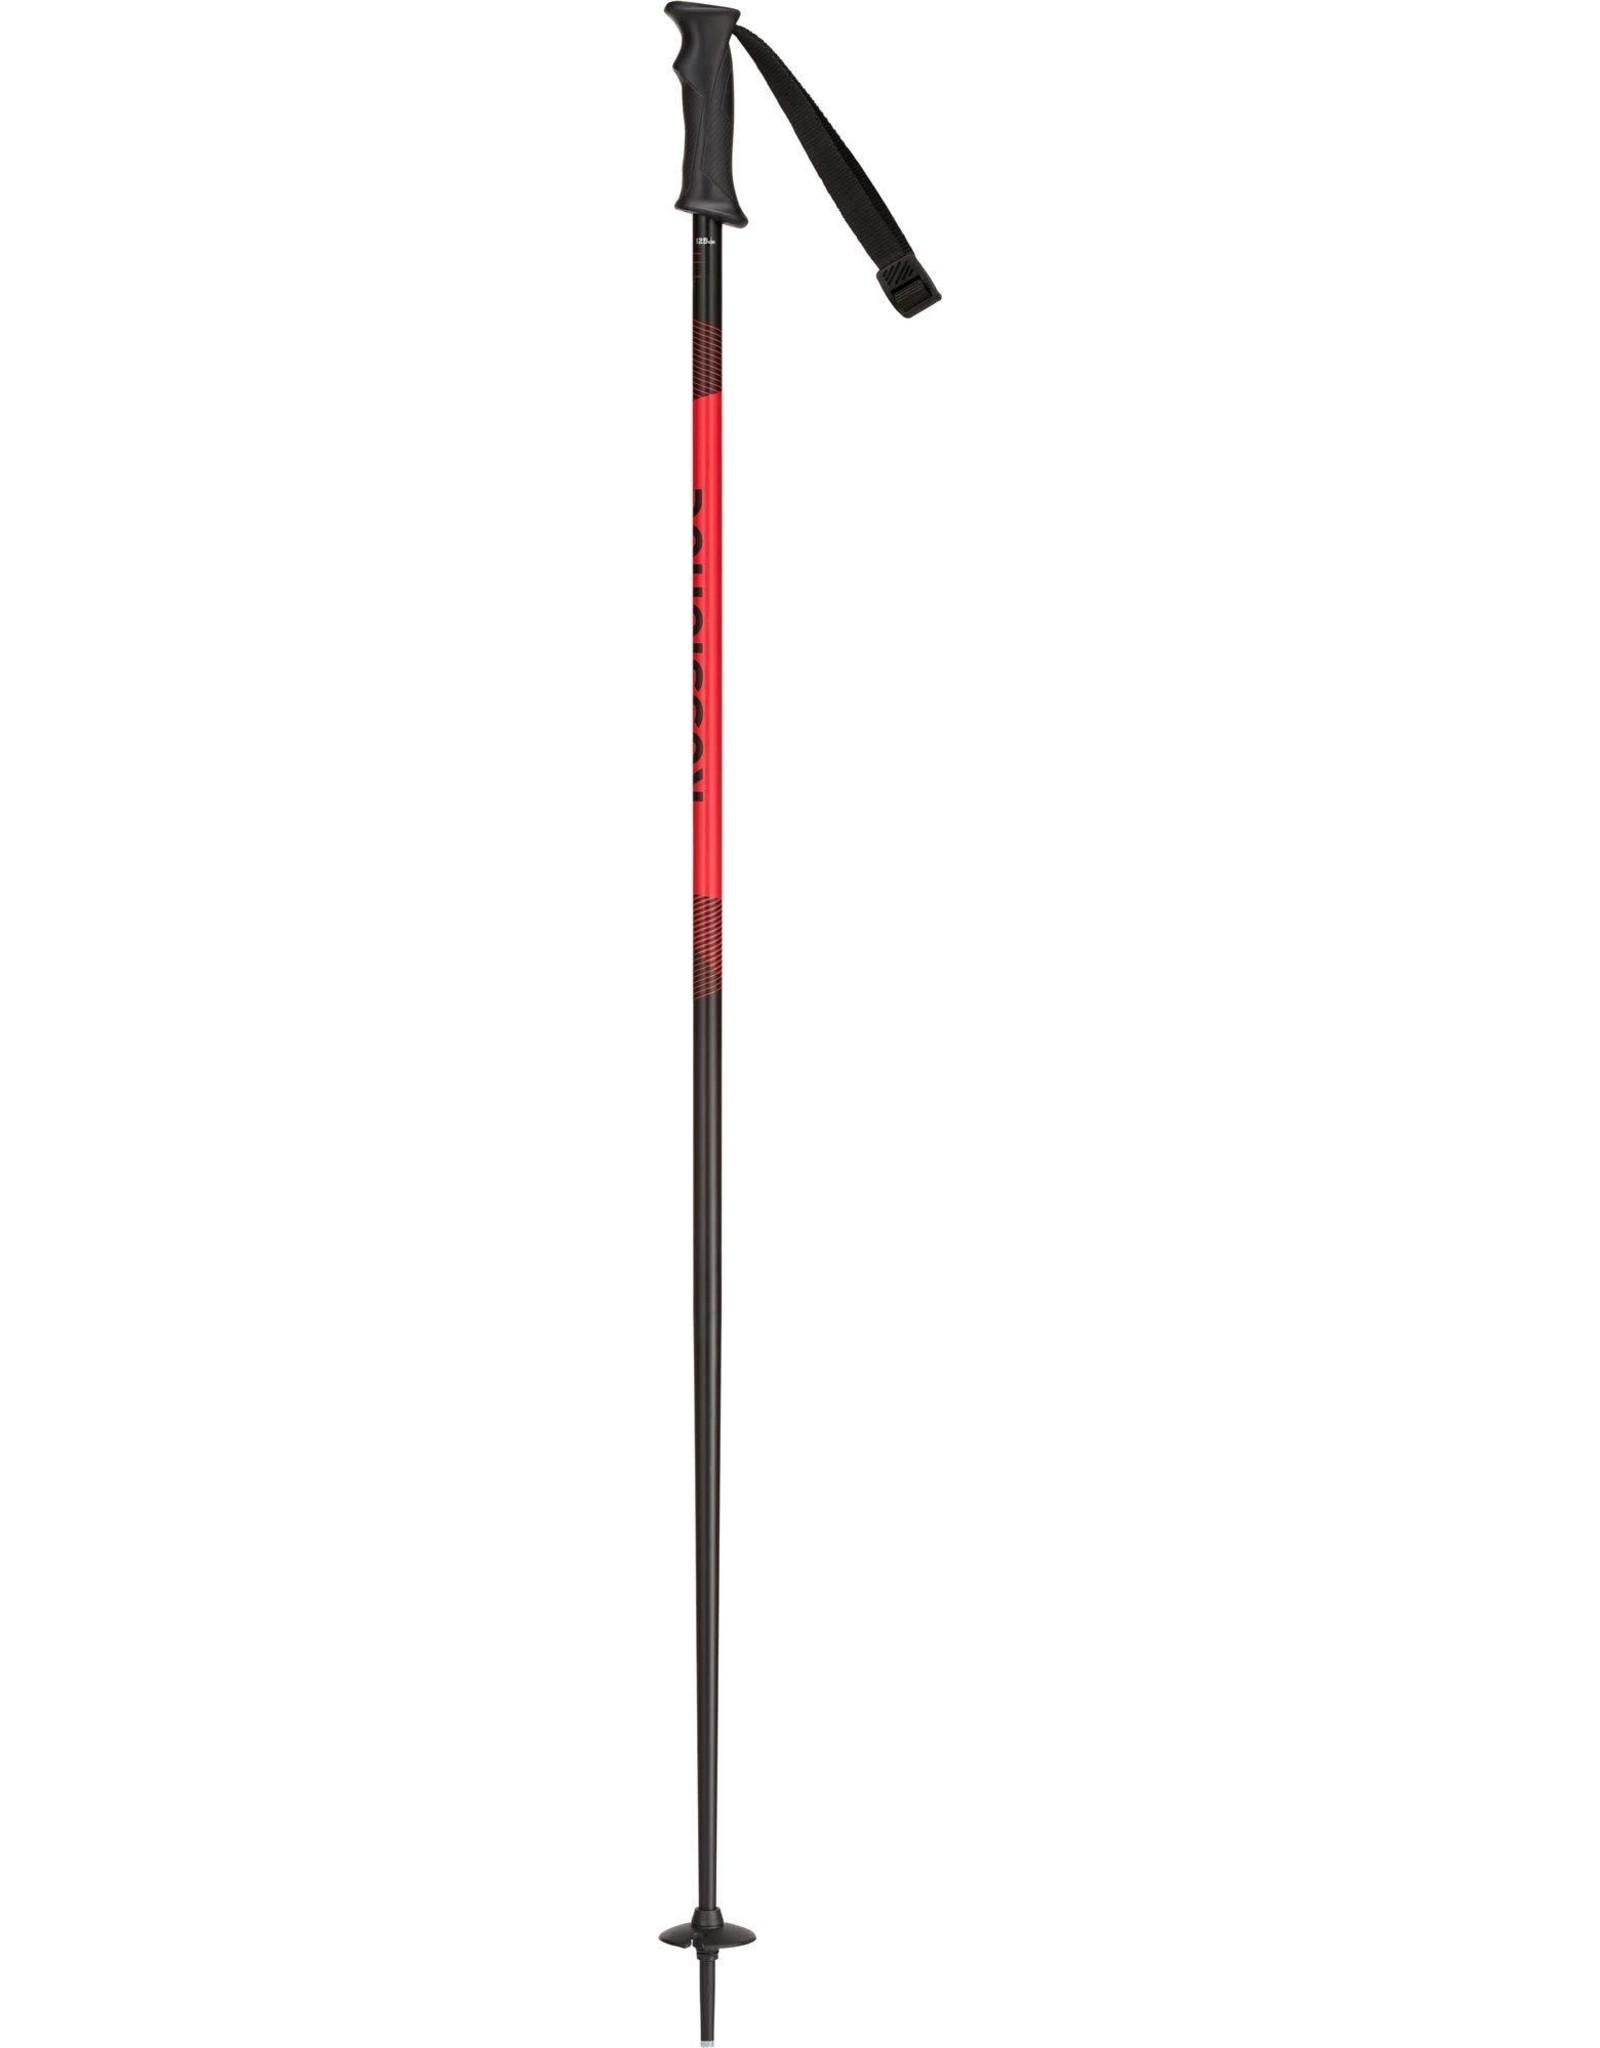 ROSSIGNOL ROSSIGNOL TACTIC BLACK/RED ALPINE SKI POLE SR 20